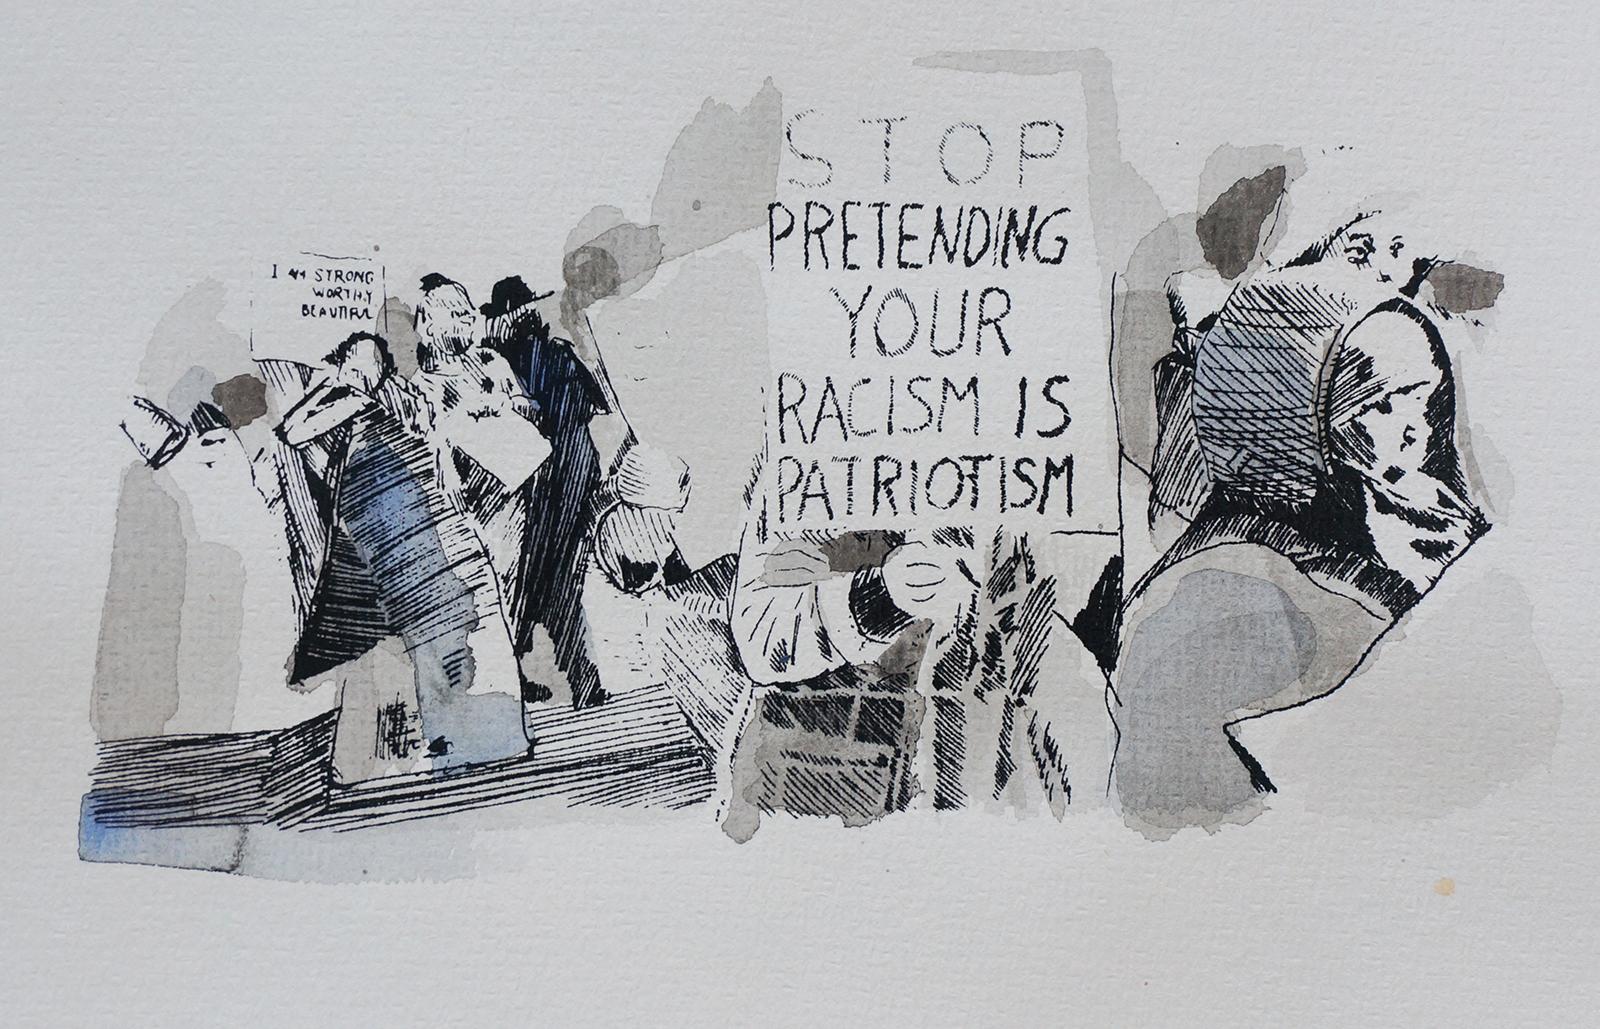 Ape_Bleakney_March Mixed Media - 'Stop Pretending (3)', 6.5''x9.5'', Screen Print + Watercolor, 2018 copy.jpg